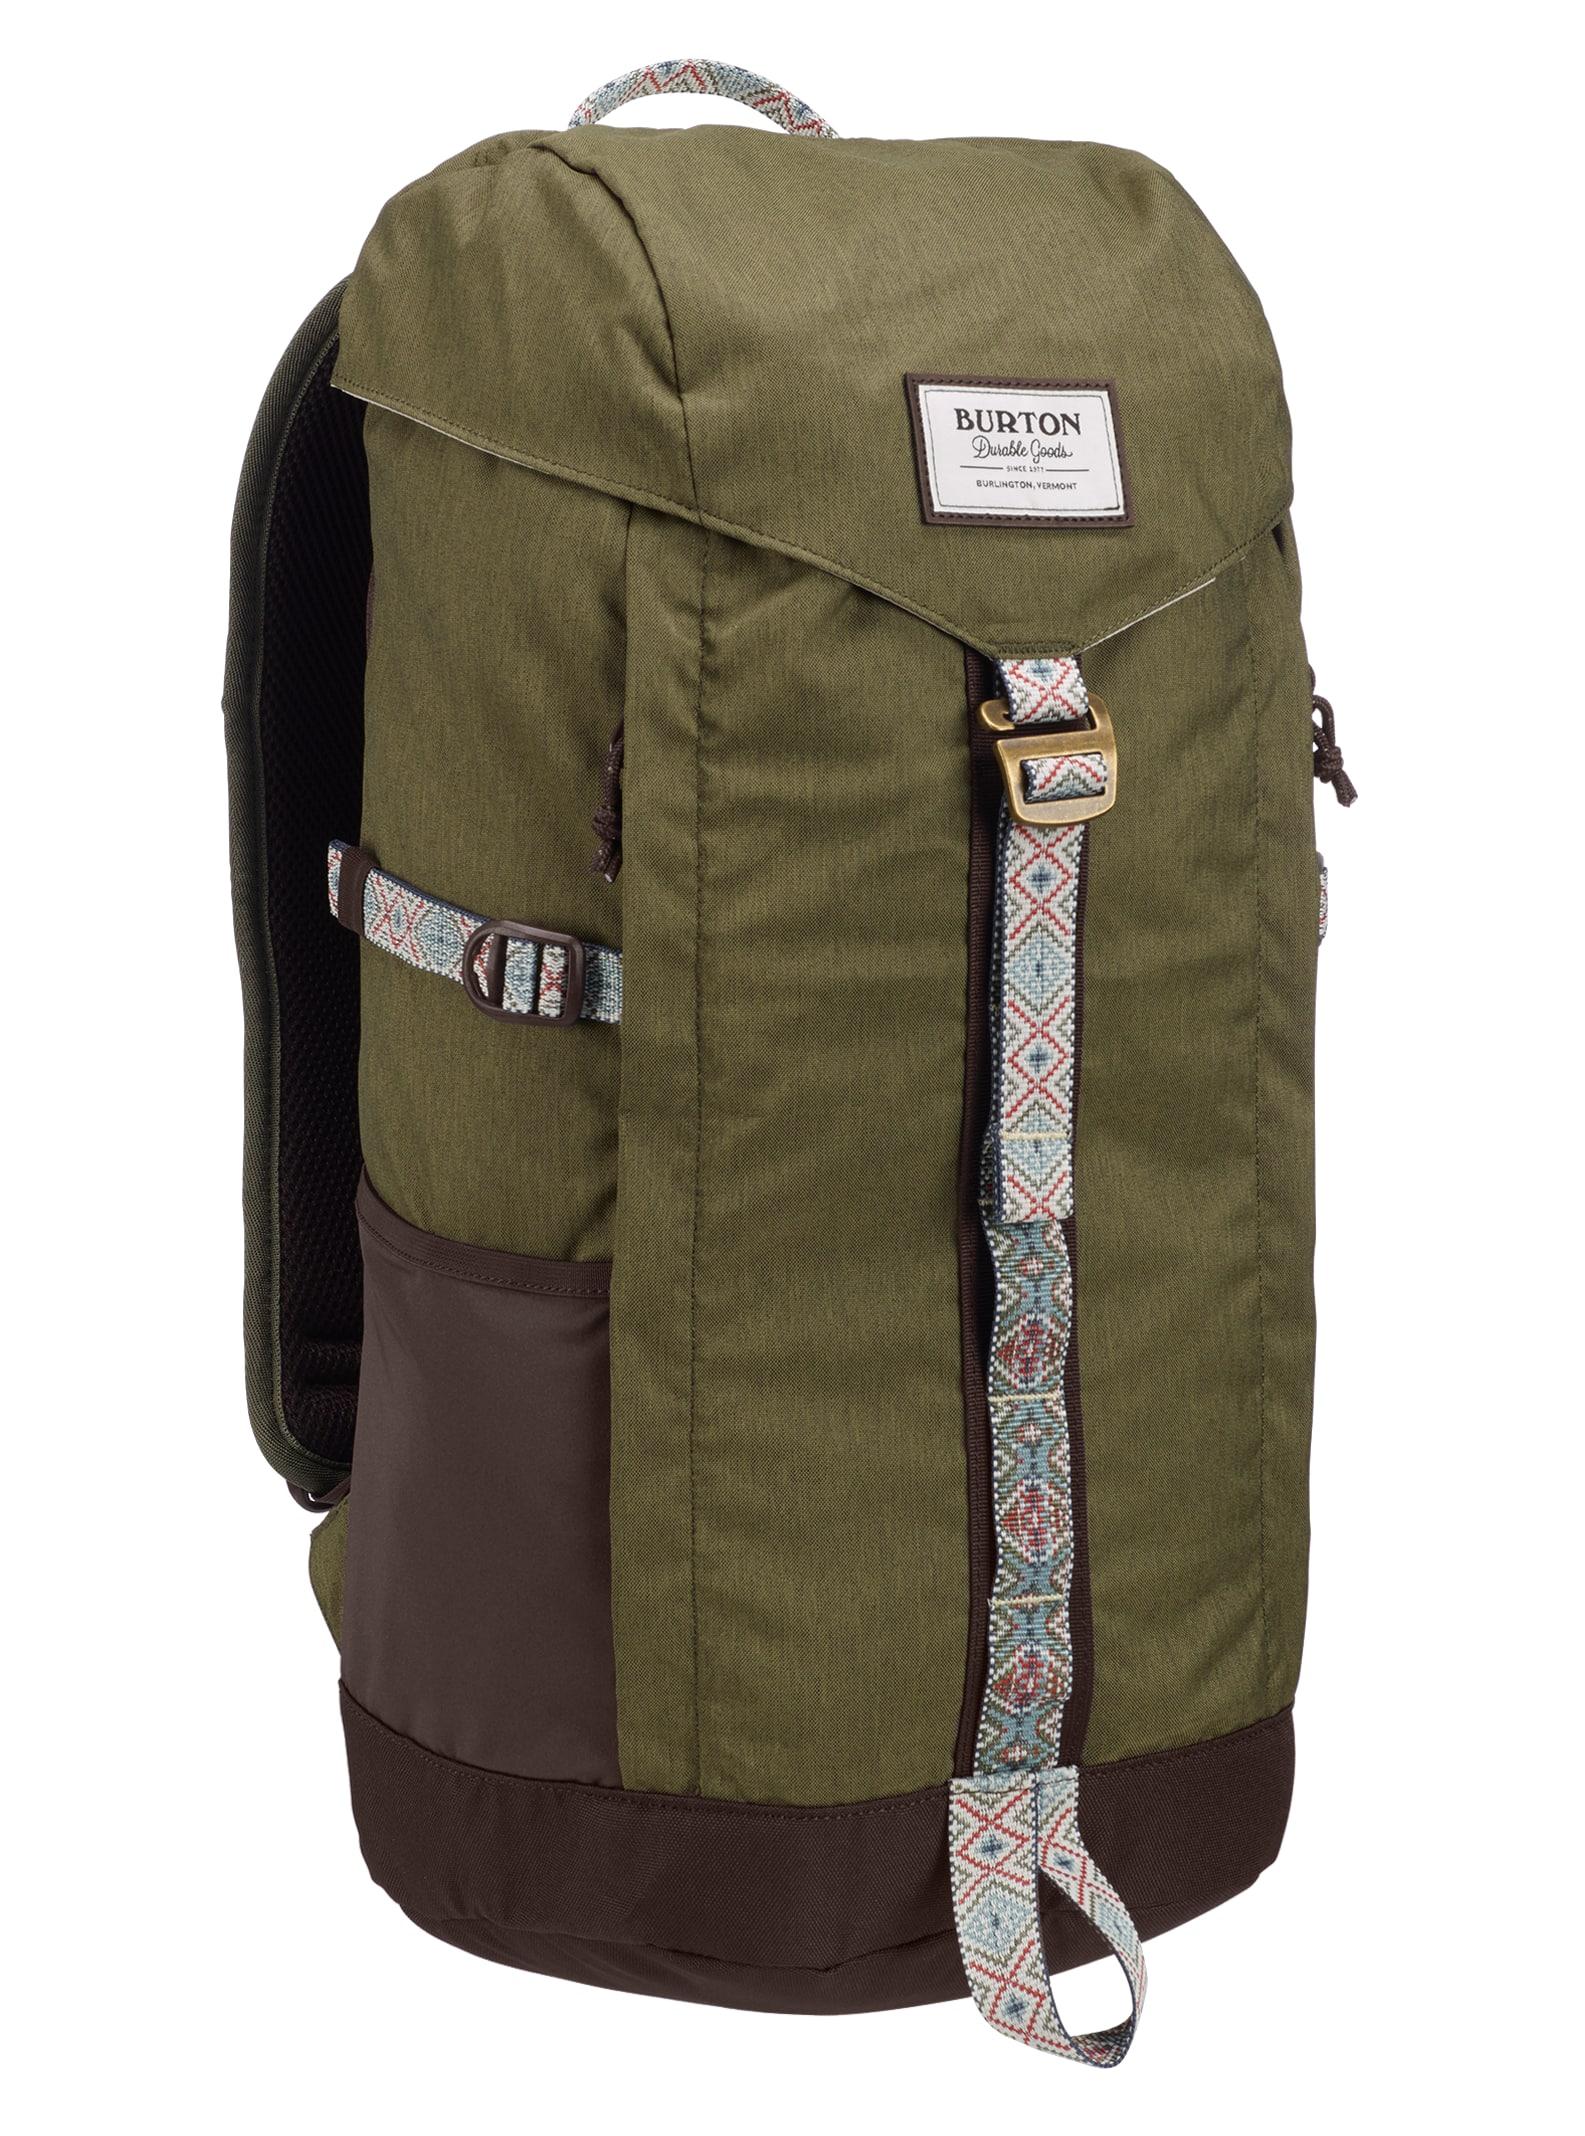 c37987cd5aa Backpacks | Burton Snowboards